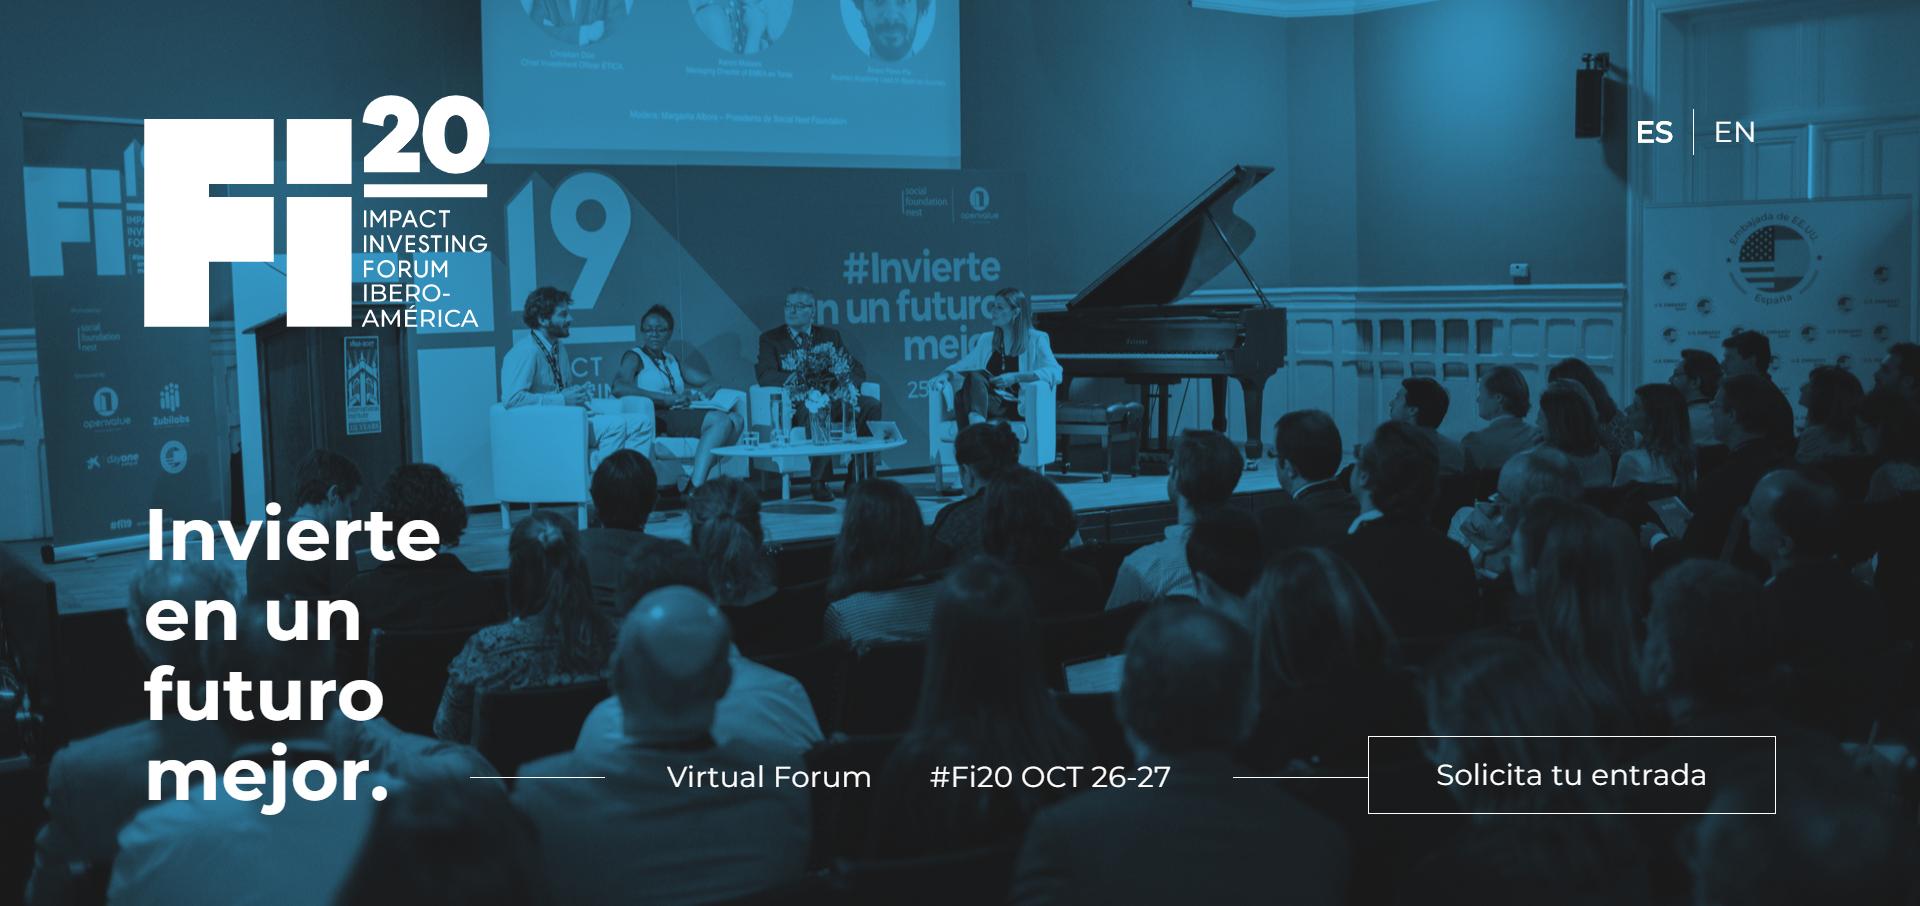 Fi20: Impact Investment Forum Iberoamérica